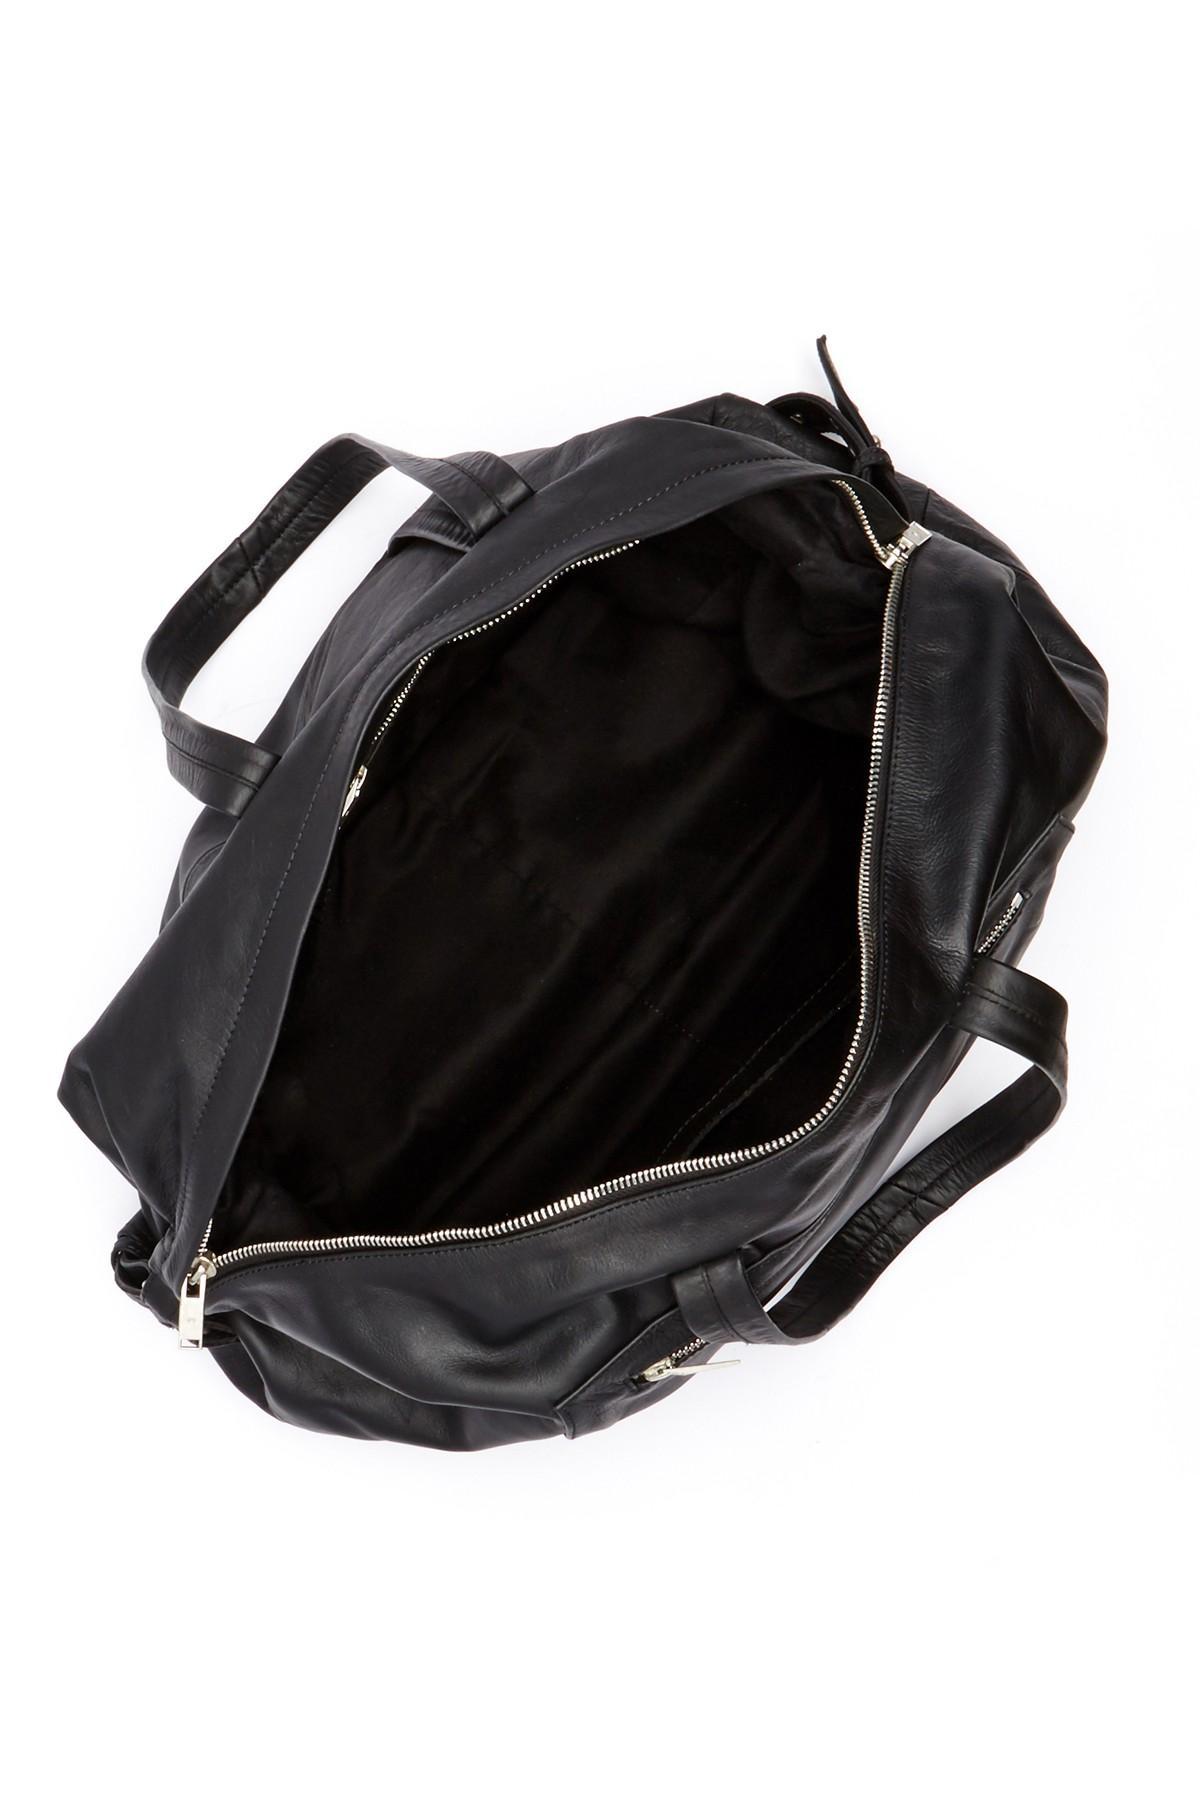 Junk De Luxe Dirk Genuine Leather Weekend Bag In Black For